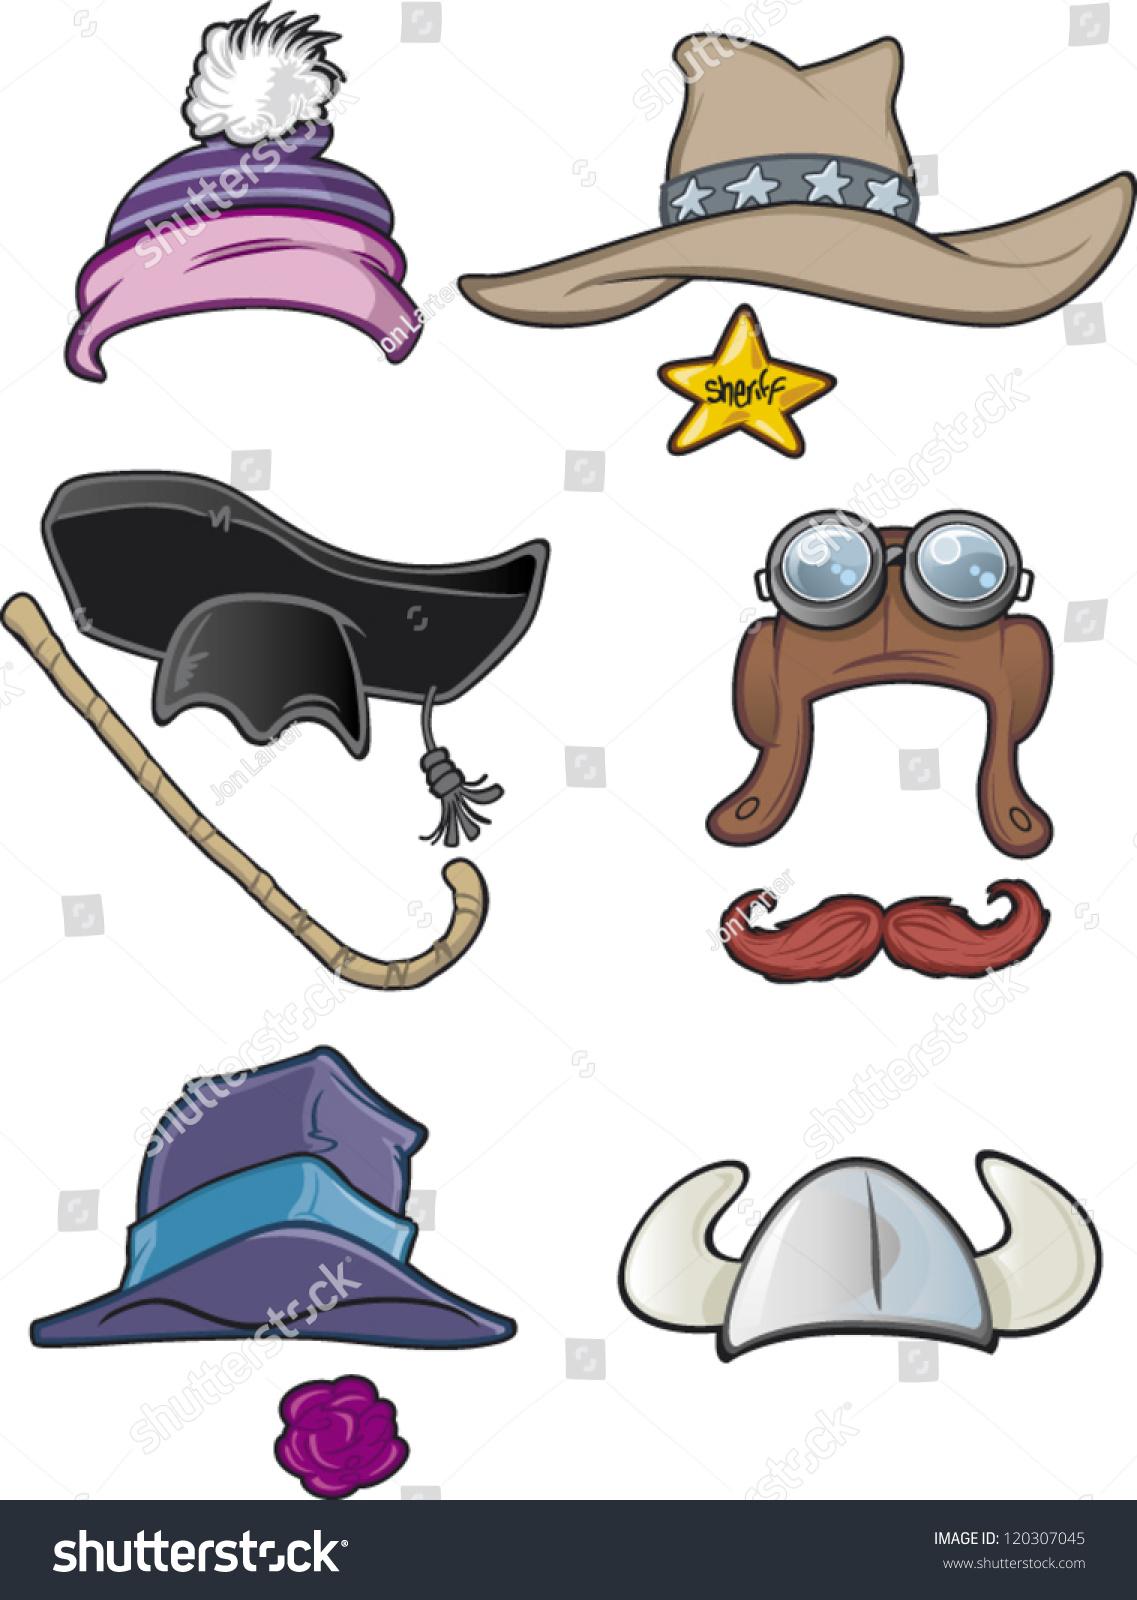 some cartoon hats 2 2 stock vector 120307045 - shutterstock